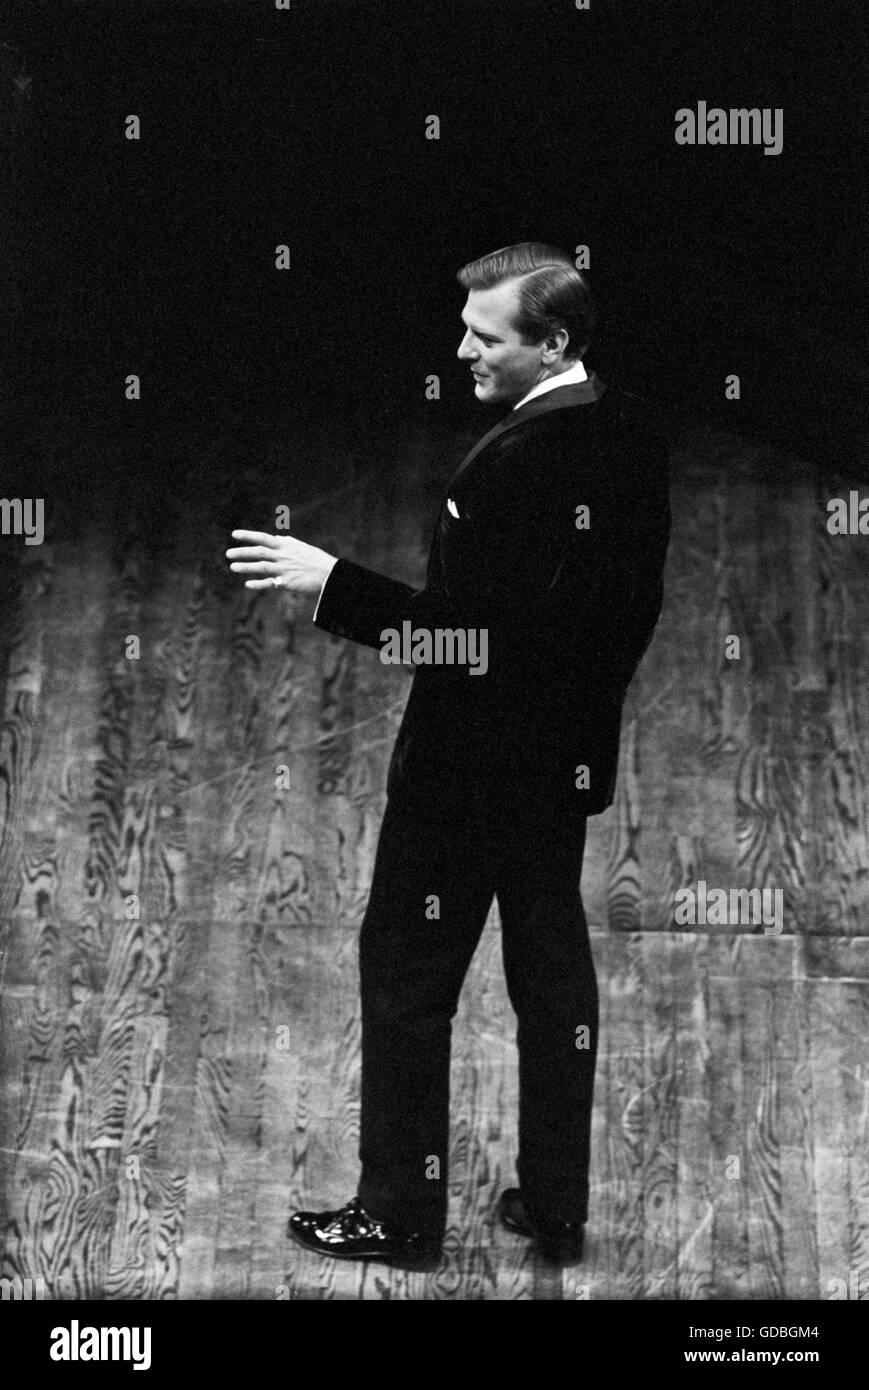 George Grizzard al Guthrie Theater Immagini Stock